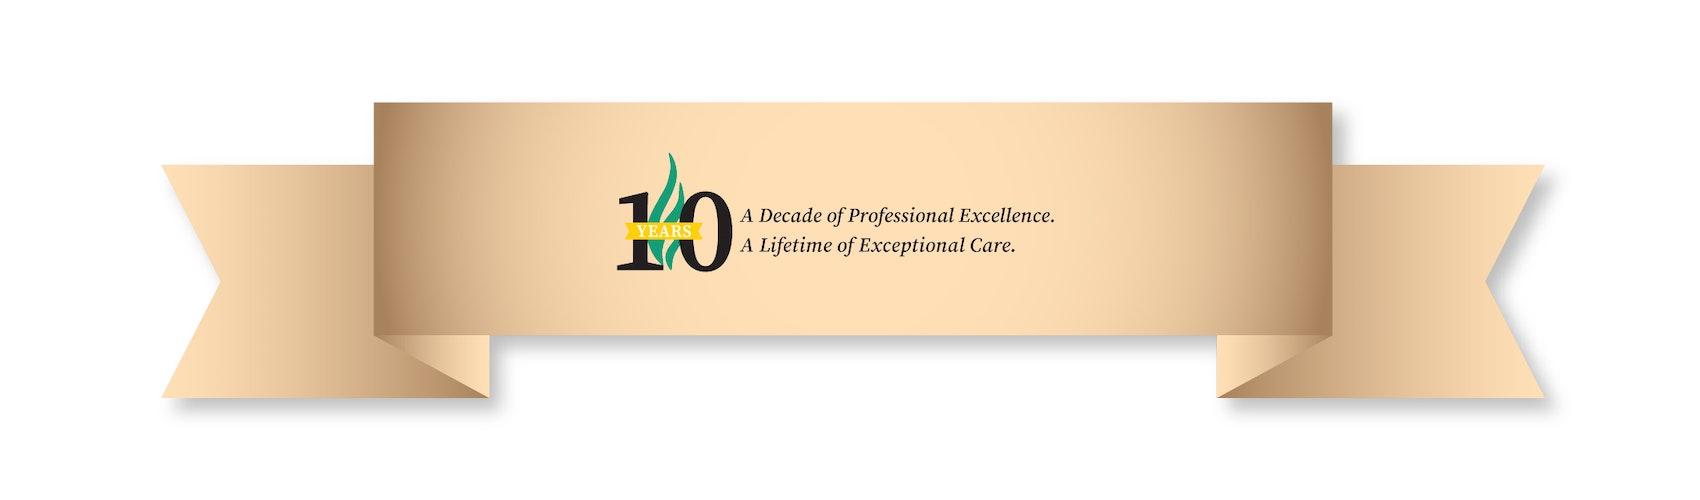 10 year banner for COPHS alumni